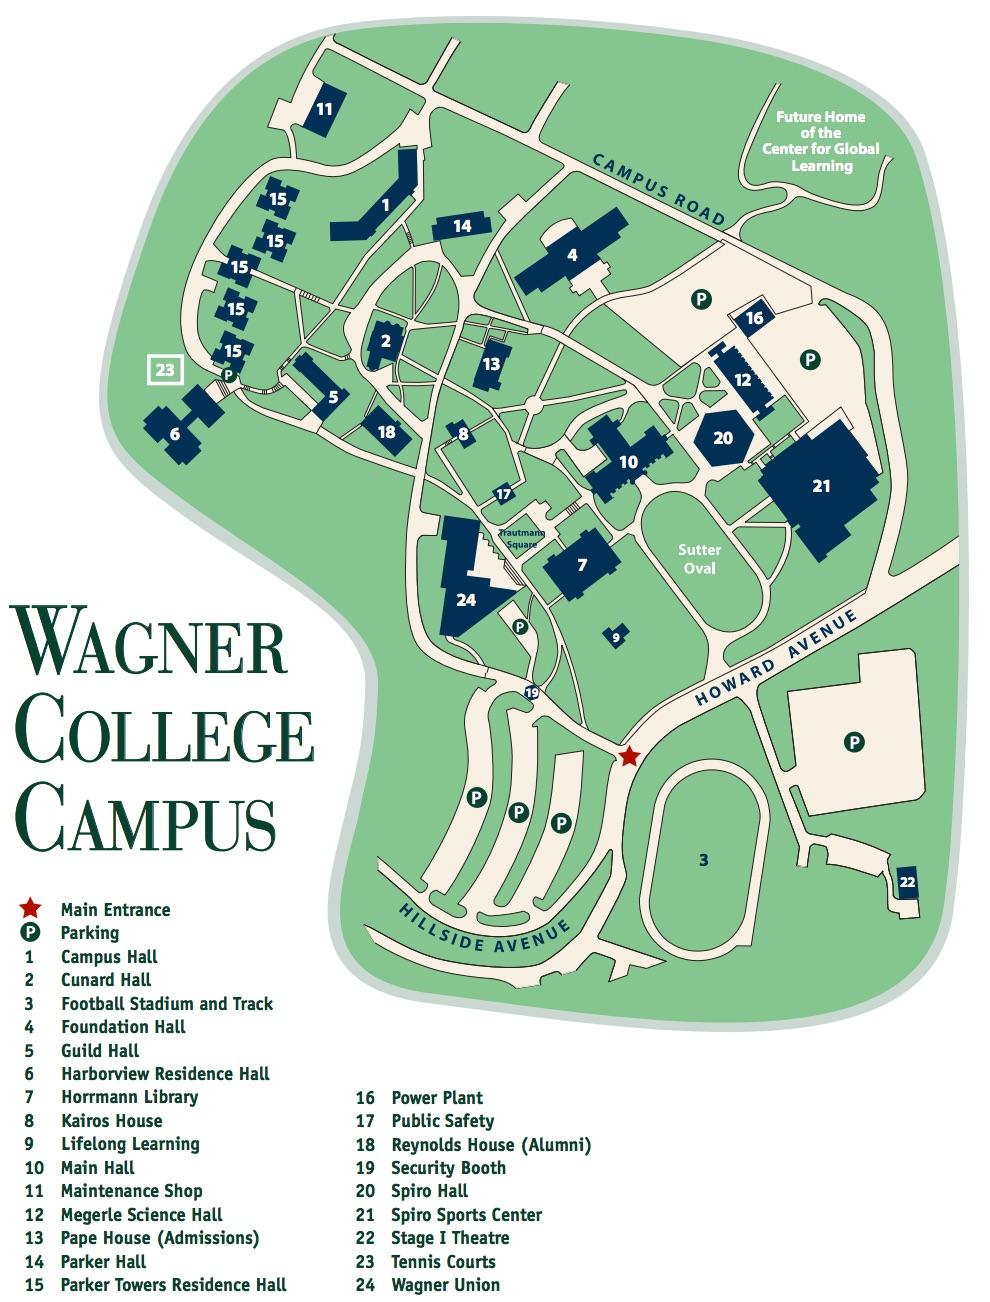 WagnerCampusMap.jpg